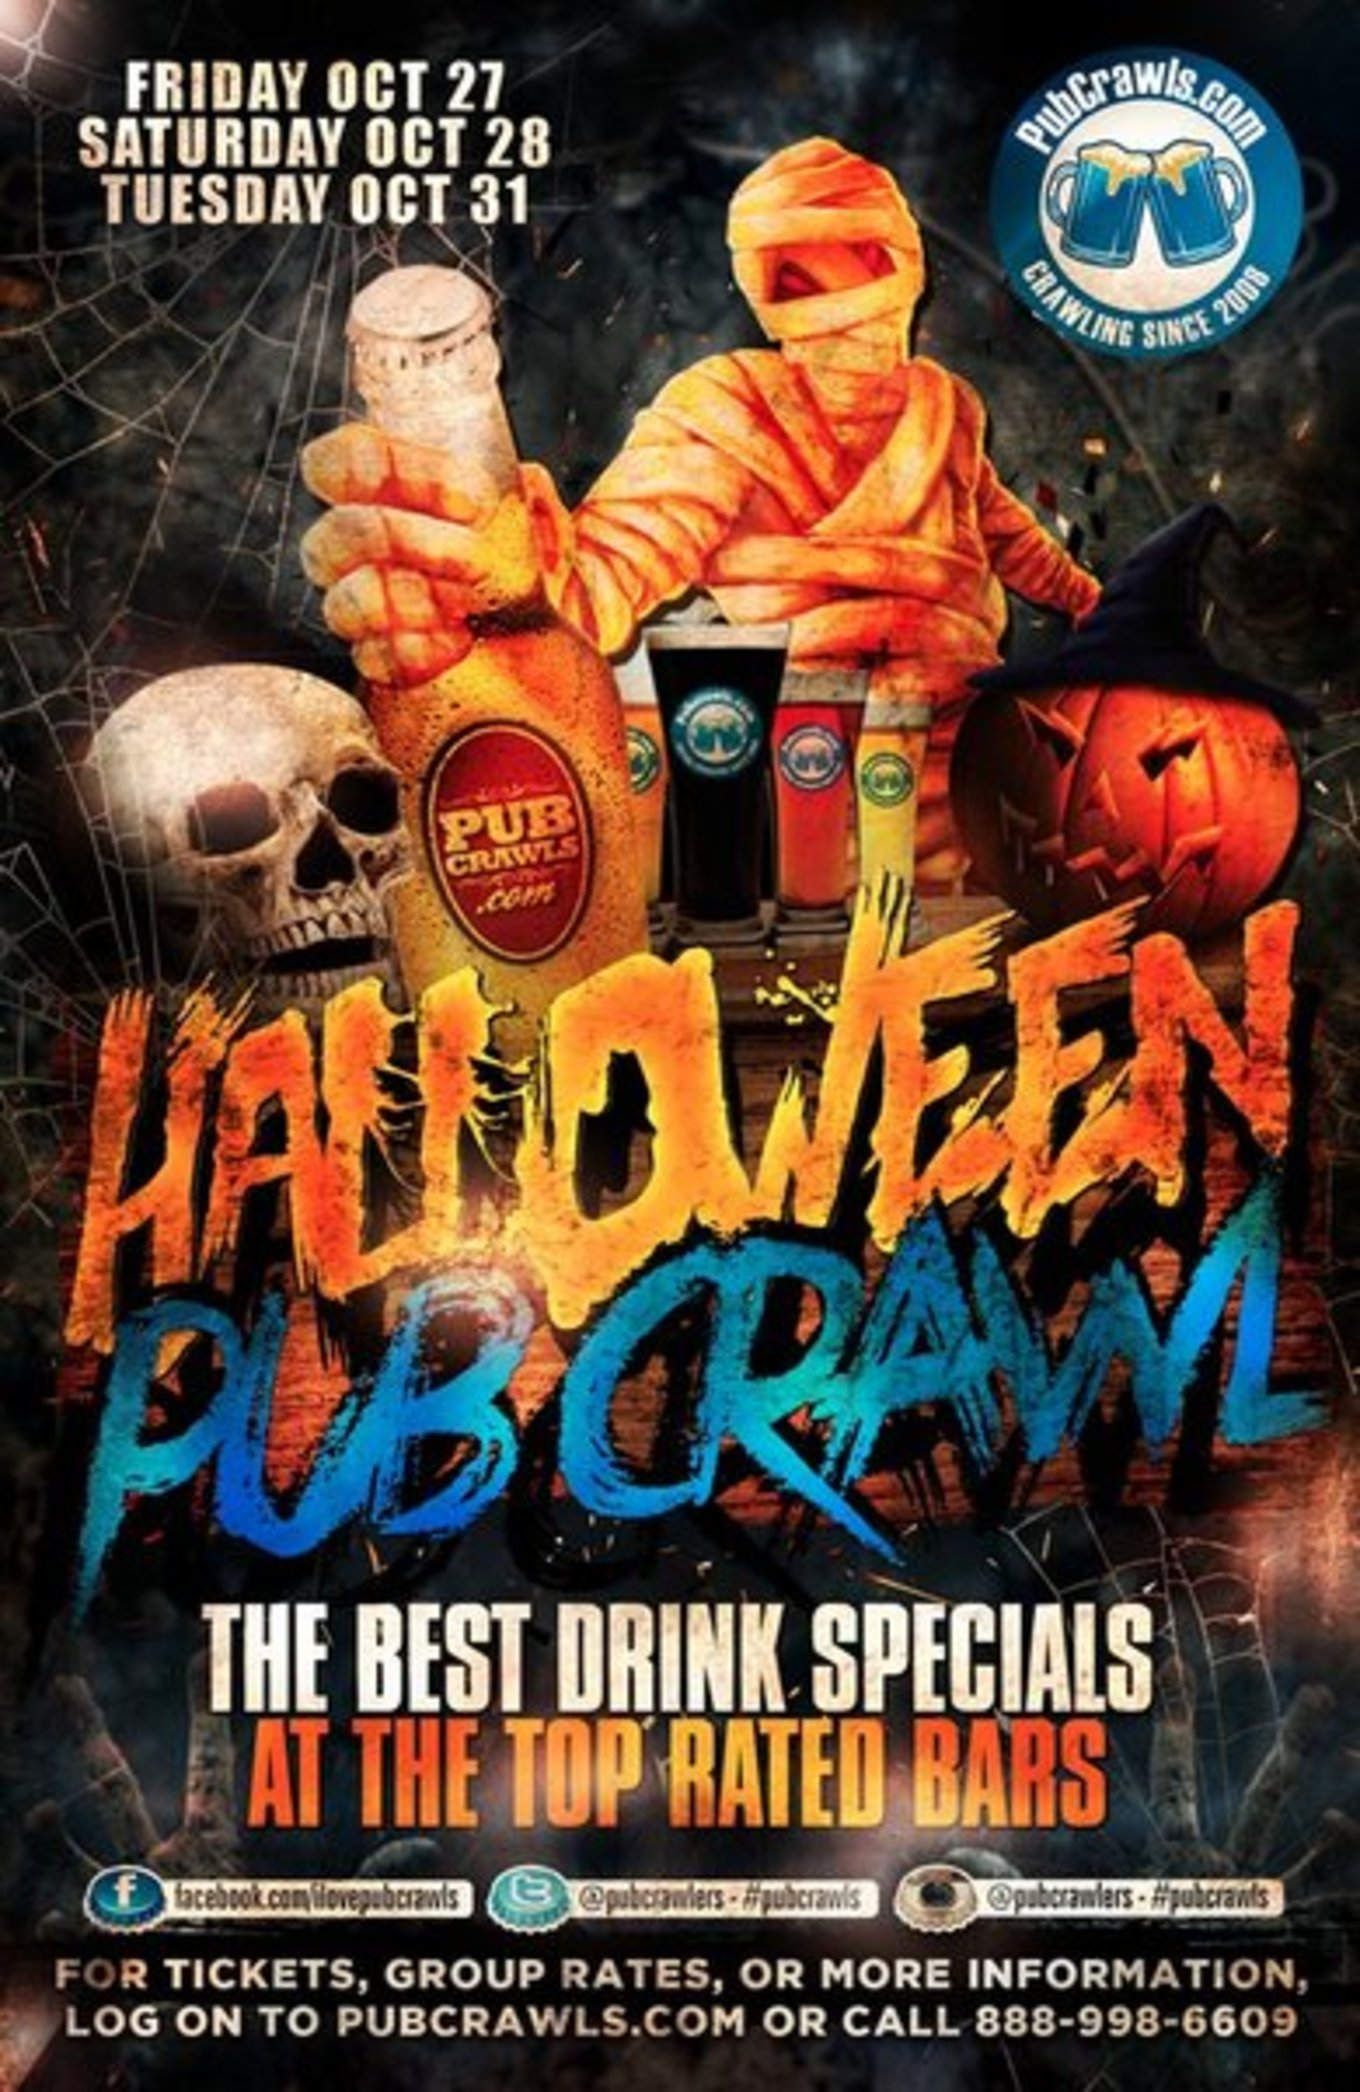 Boston Halloween Bar Crawl 2020 Oct 27 Halloween Pub Crawl Boston   Tickets   October 27, 2017